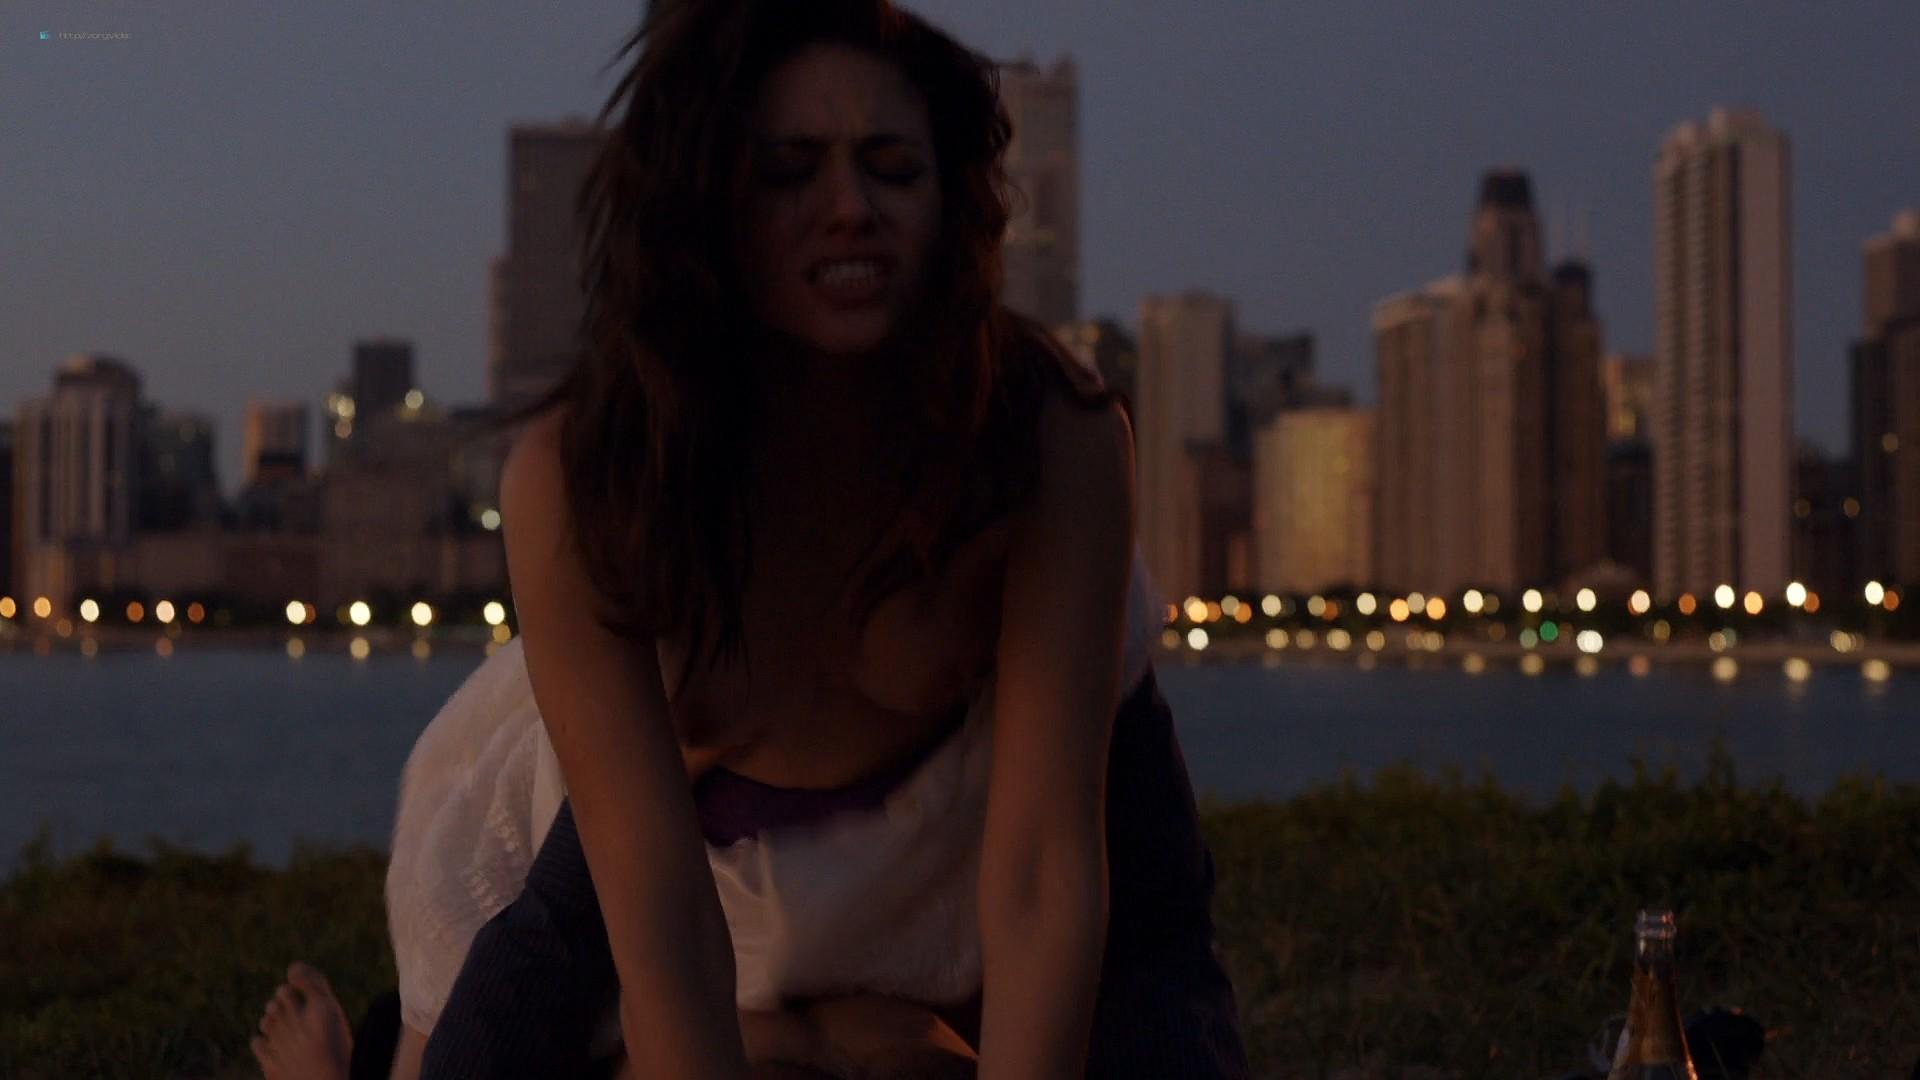 Emmy Rossum nude topless Laura Wiggins nude sex - Shameless (2012) s2e1 HD 1080p BluRay (11)